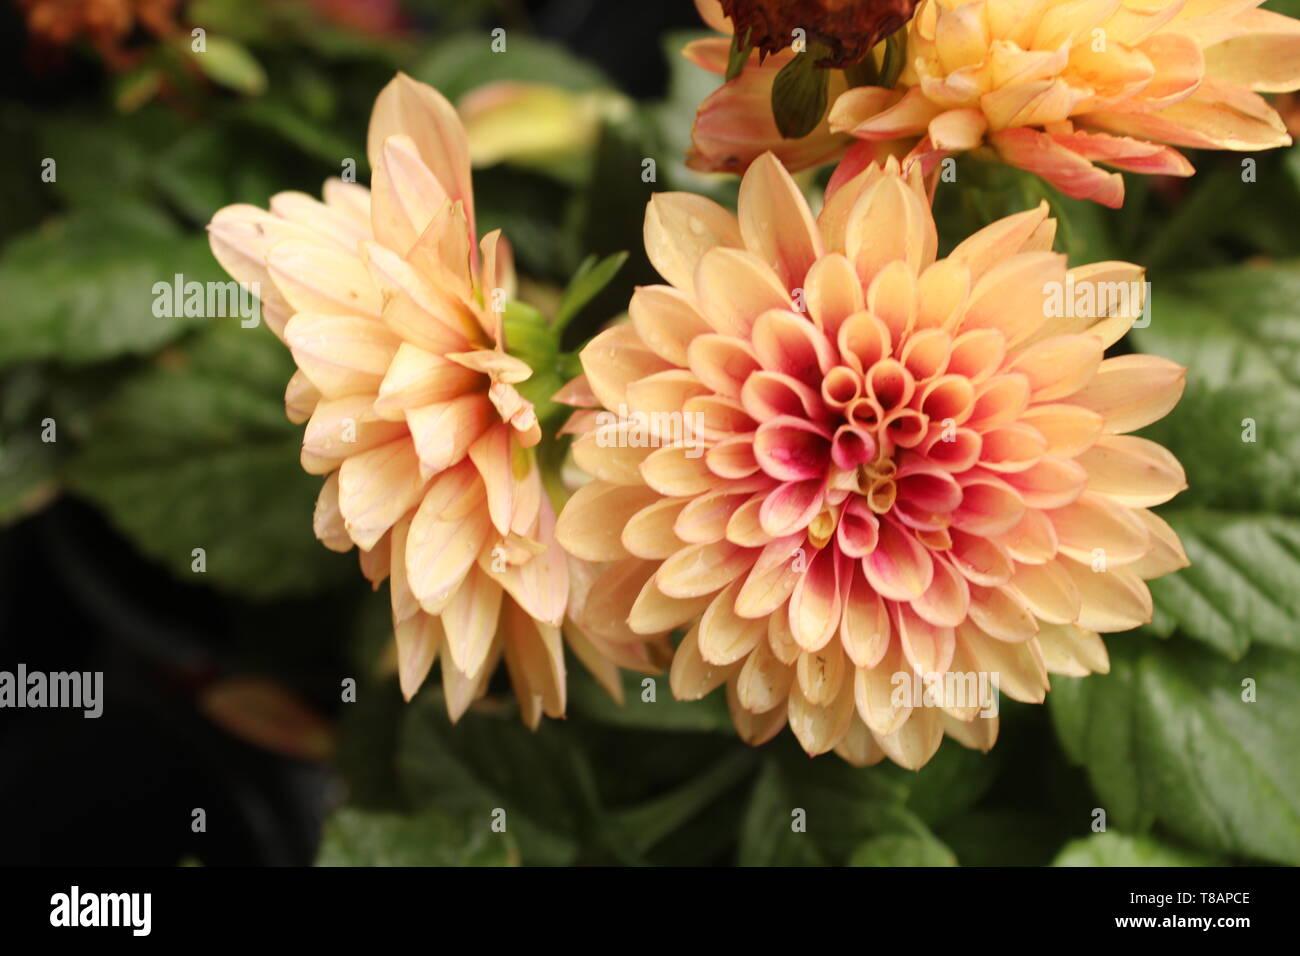 Bear, DE/USA 4/30/2019: Genus: Dahlia, Family: Asteraceae, order: asterales, Native to: Mexico. - Stock Image